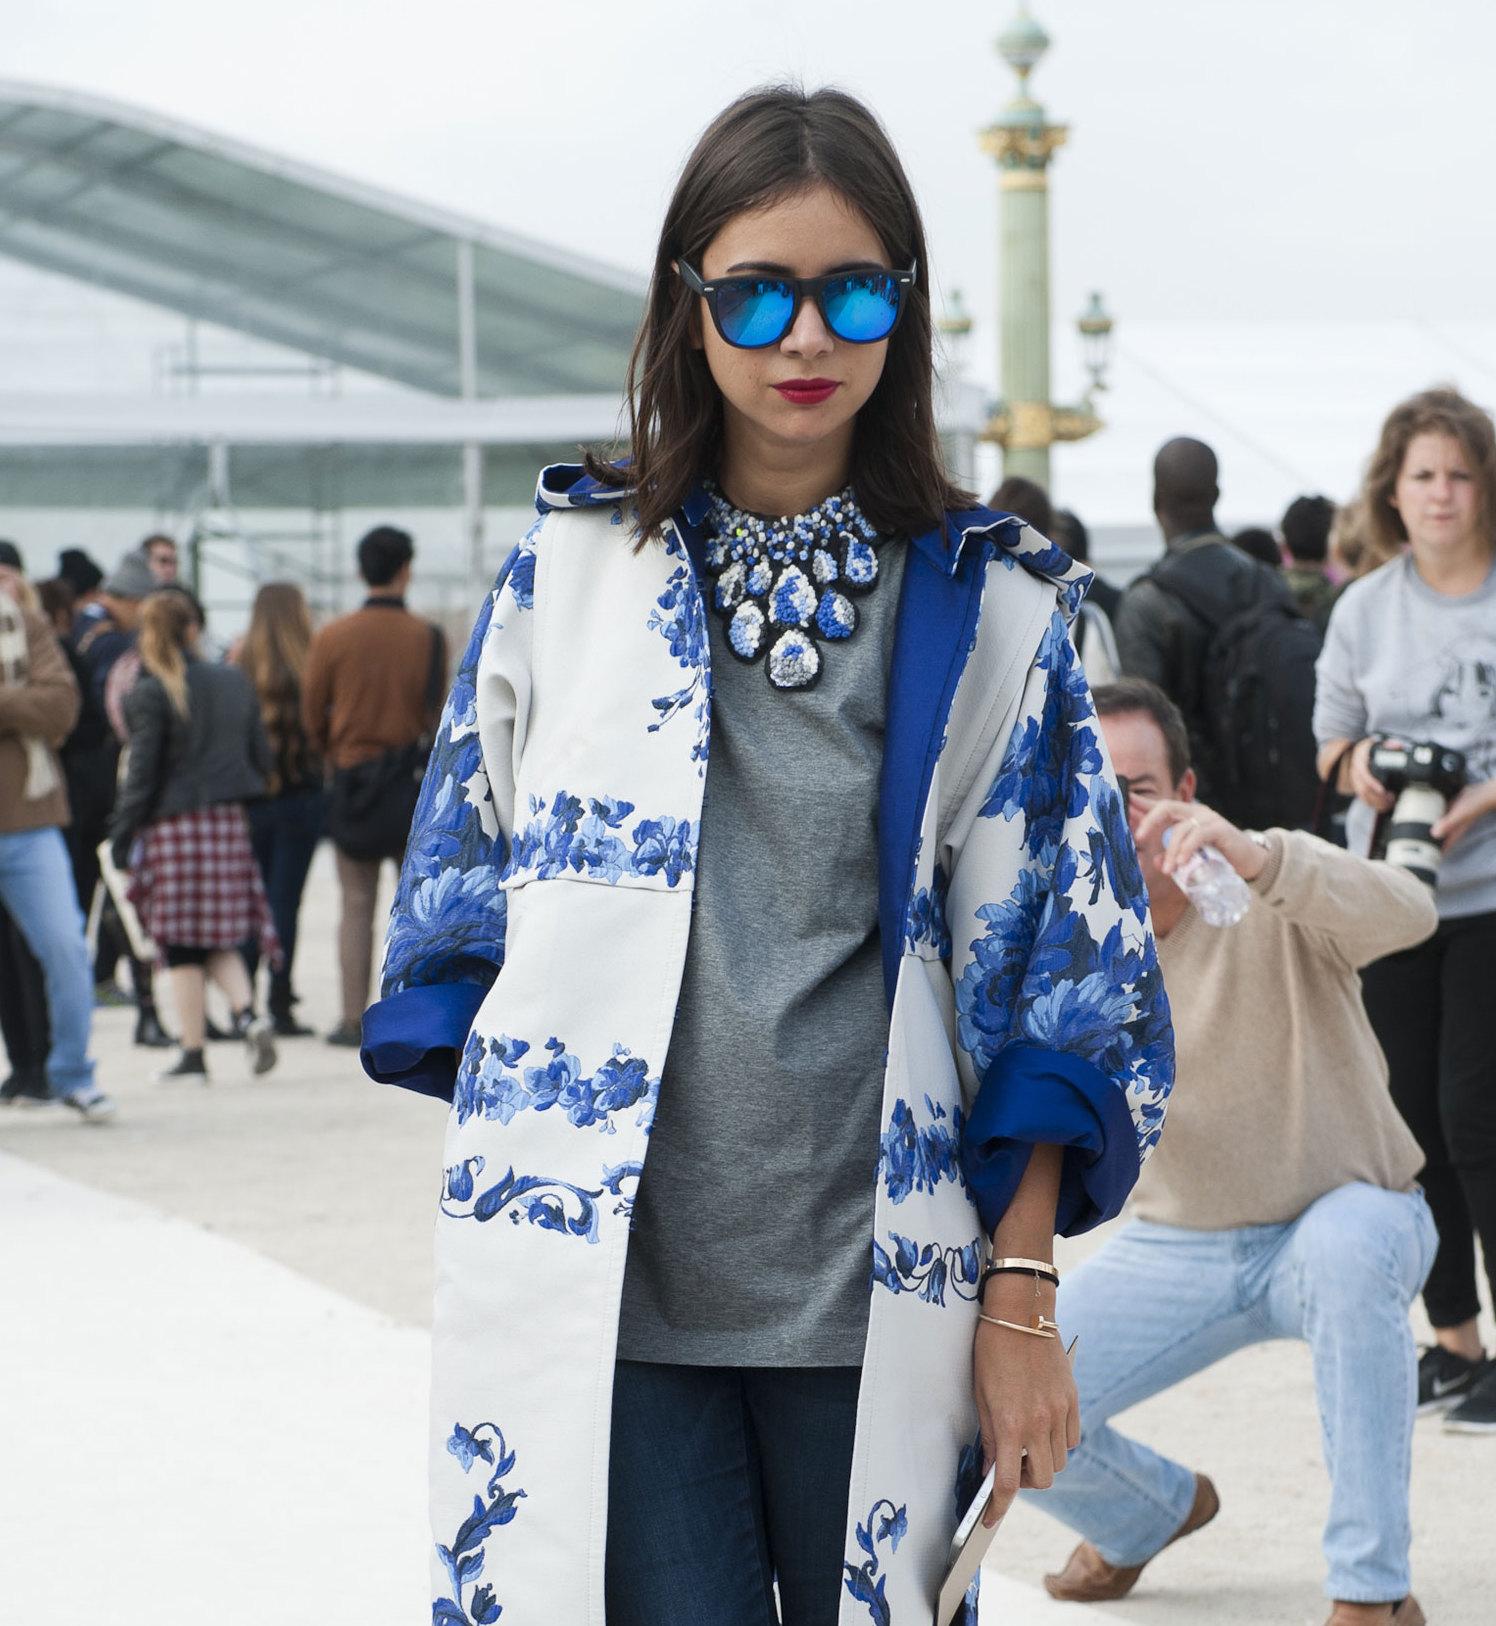 Street Fashion Paris Fashion Week Wiosna Lato 2014 Cz 2